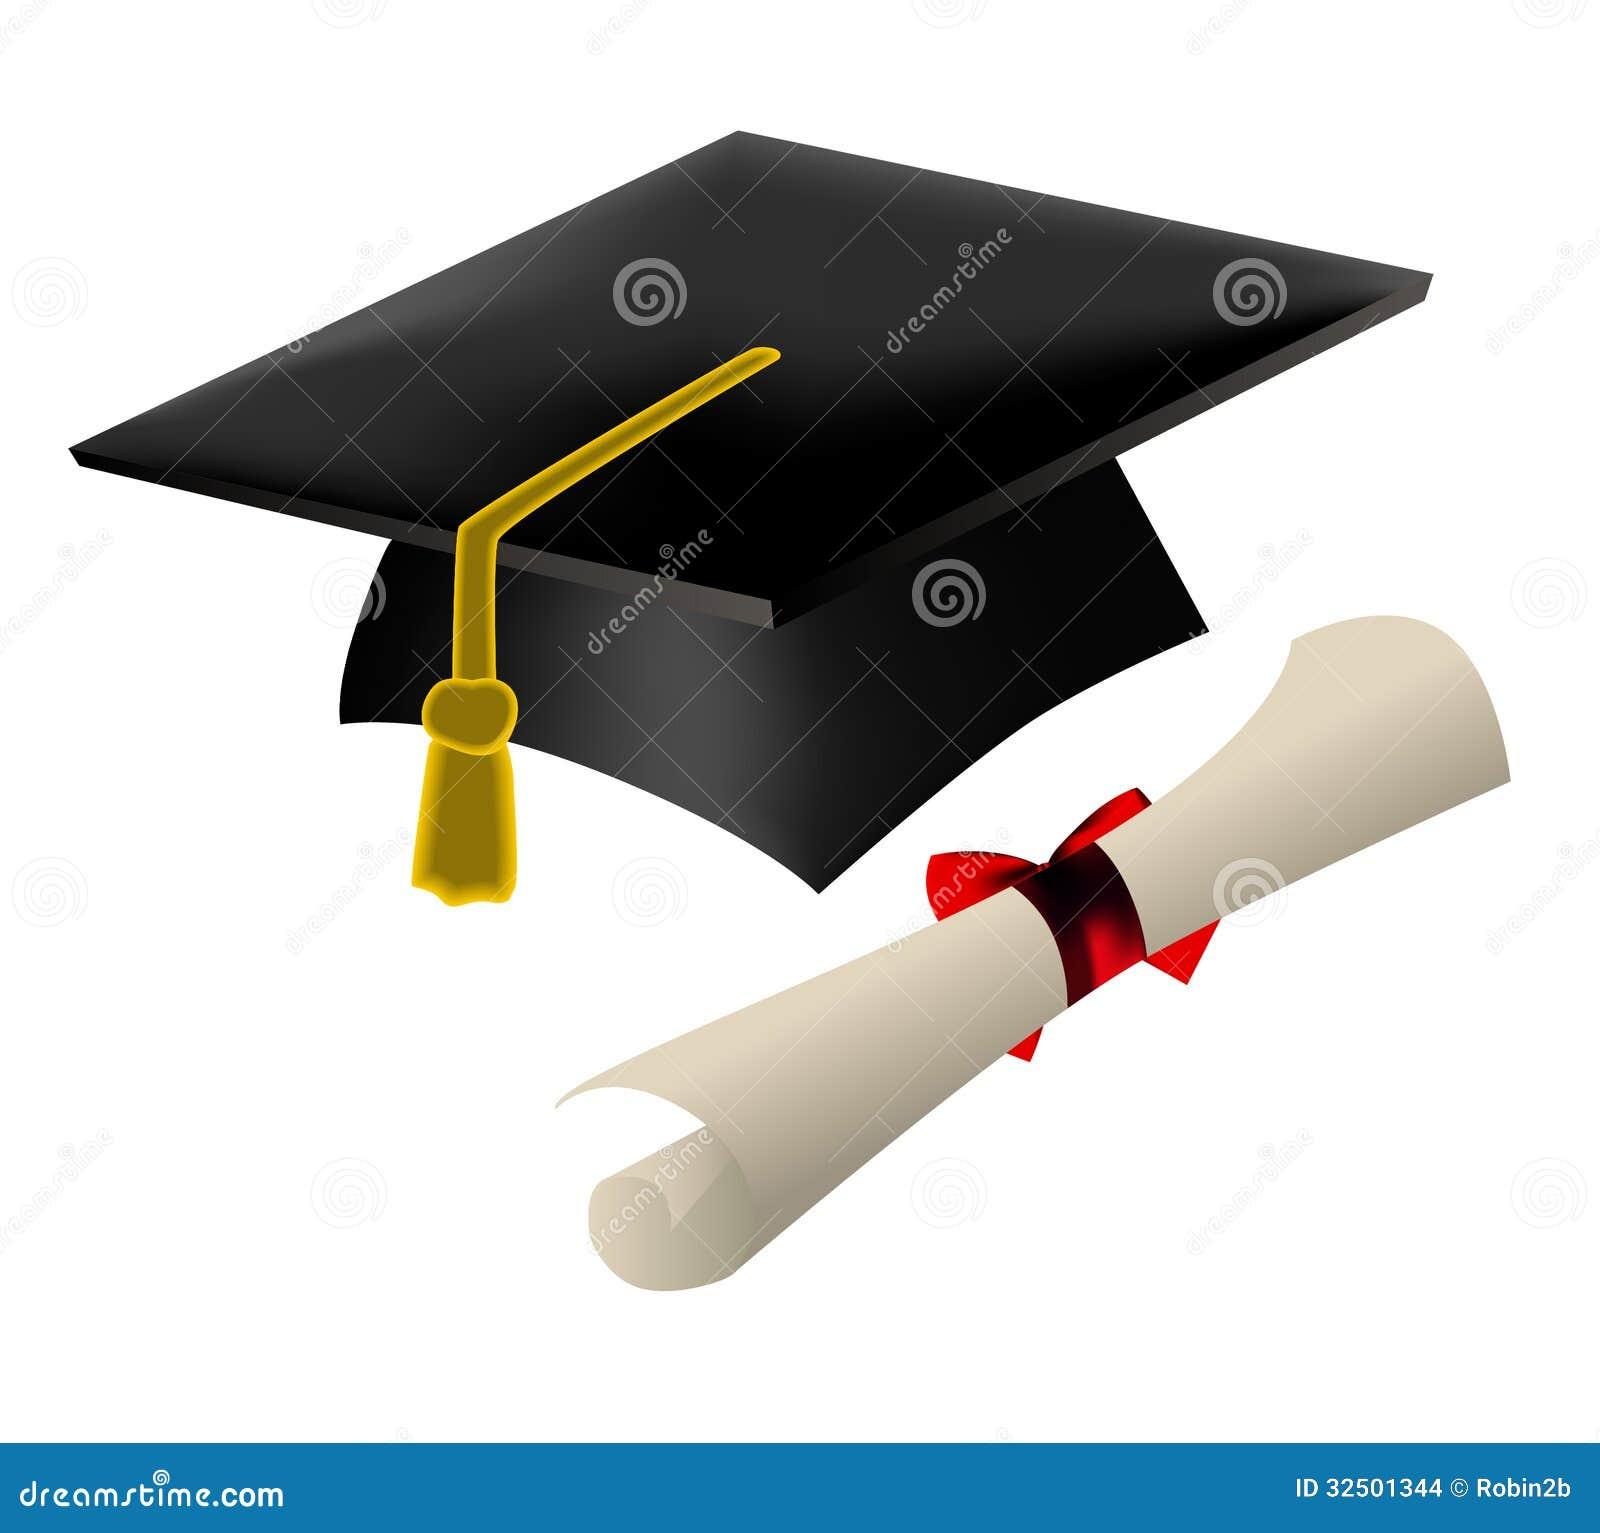 graduation cap and diploma illustration background mr no pr no 2 1970 ...